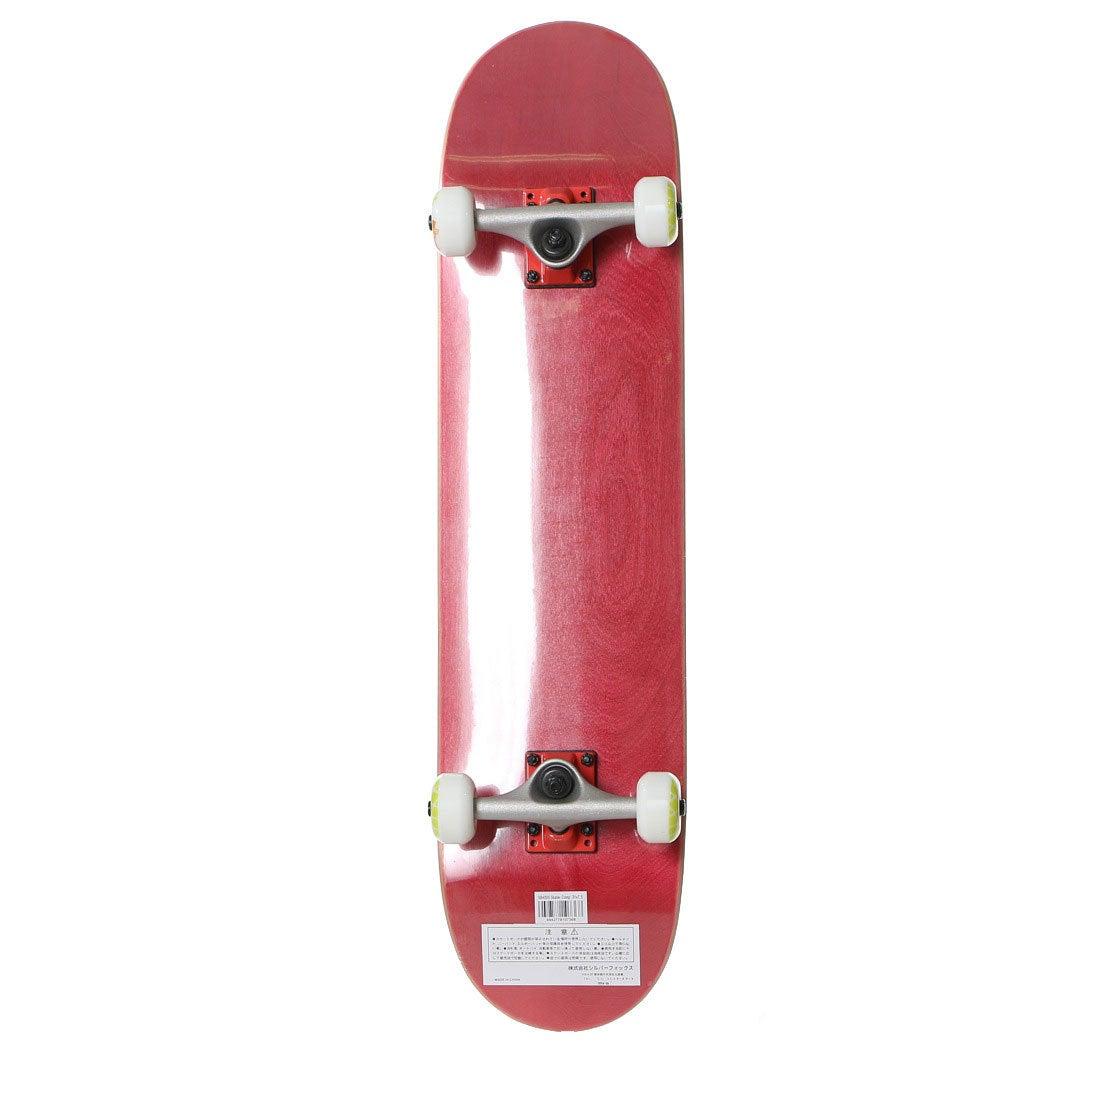 【SALE 5%OFF】シルバーフォックス Silver Fox ユニセックス エクストリームスポーツ ボード/スケート スケートボードコンプリート SB4005